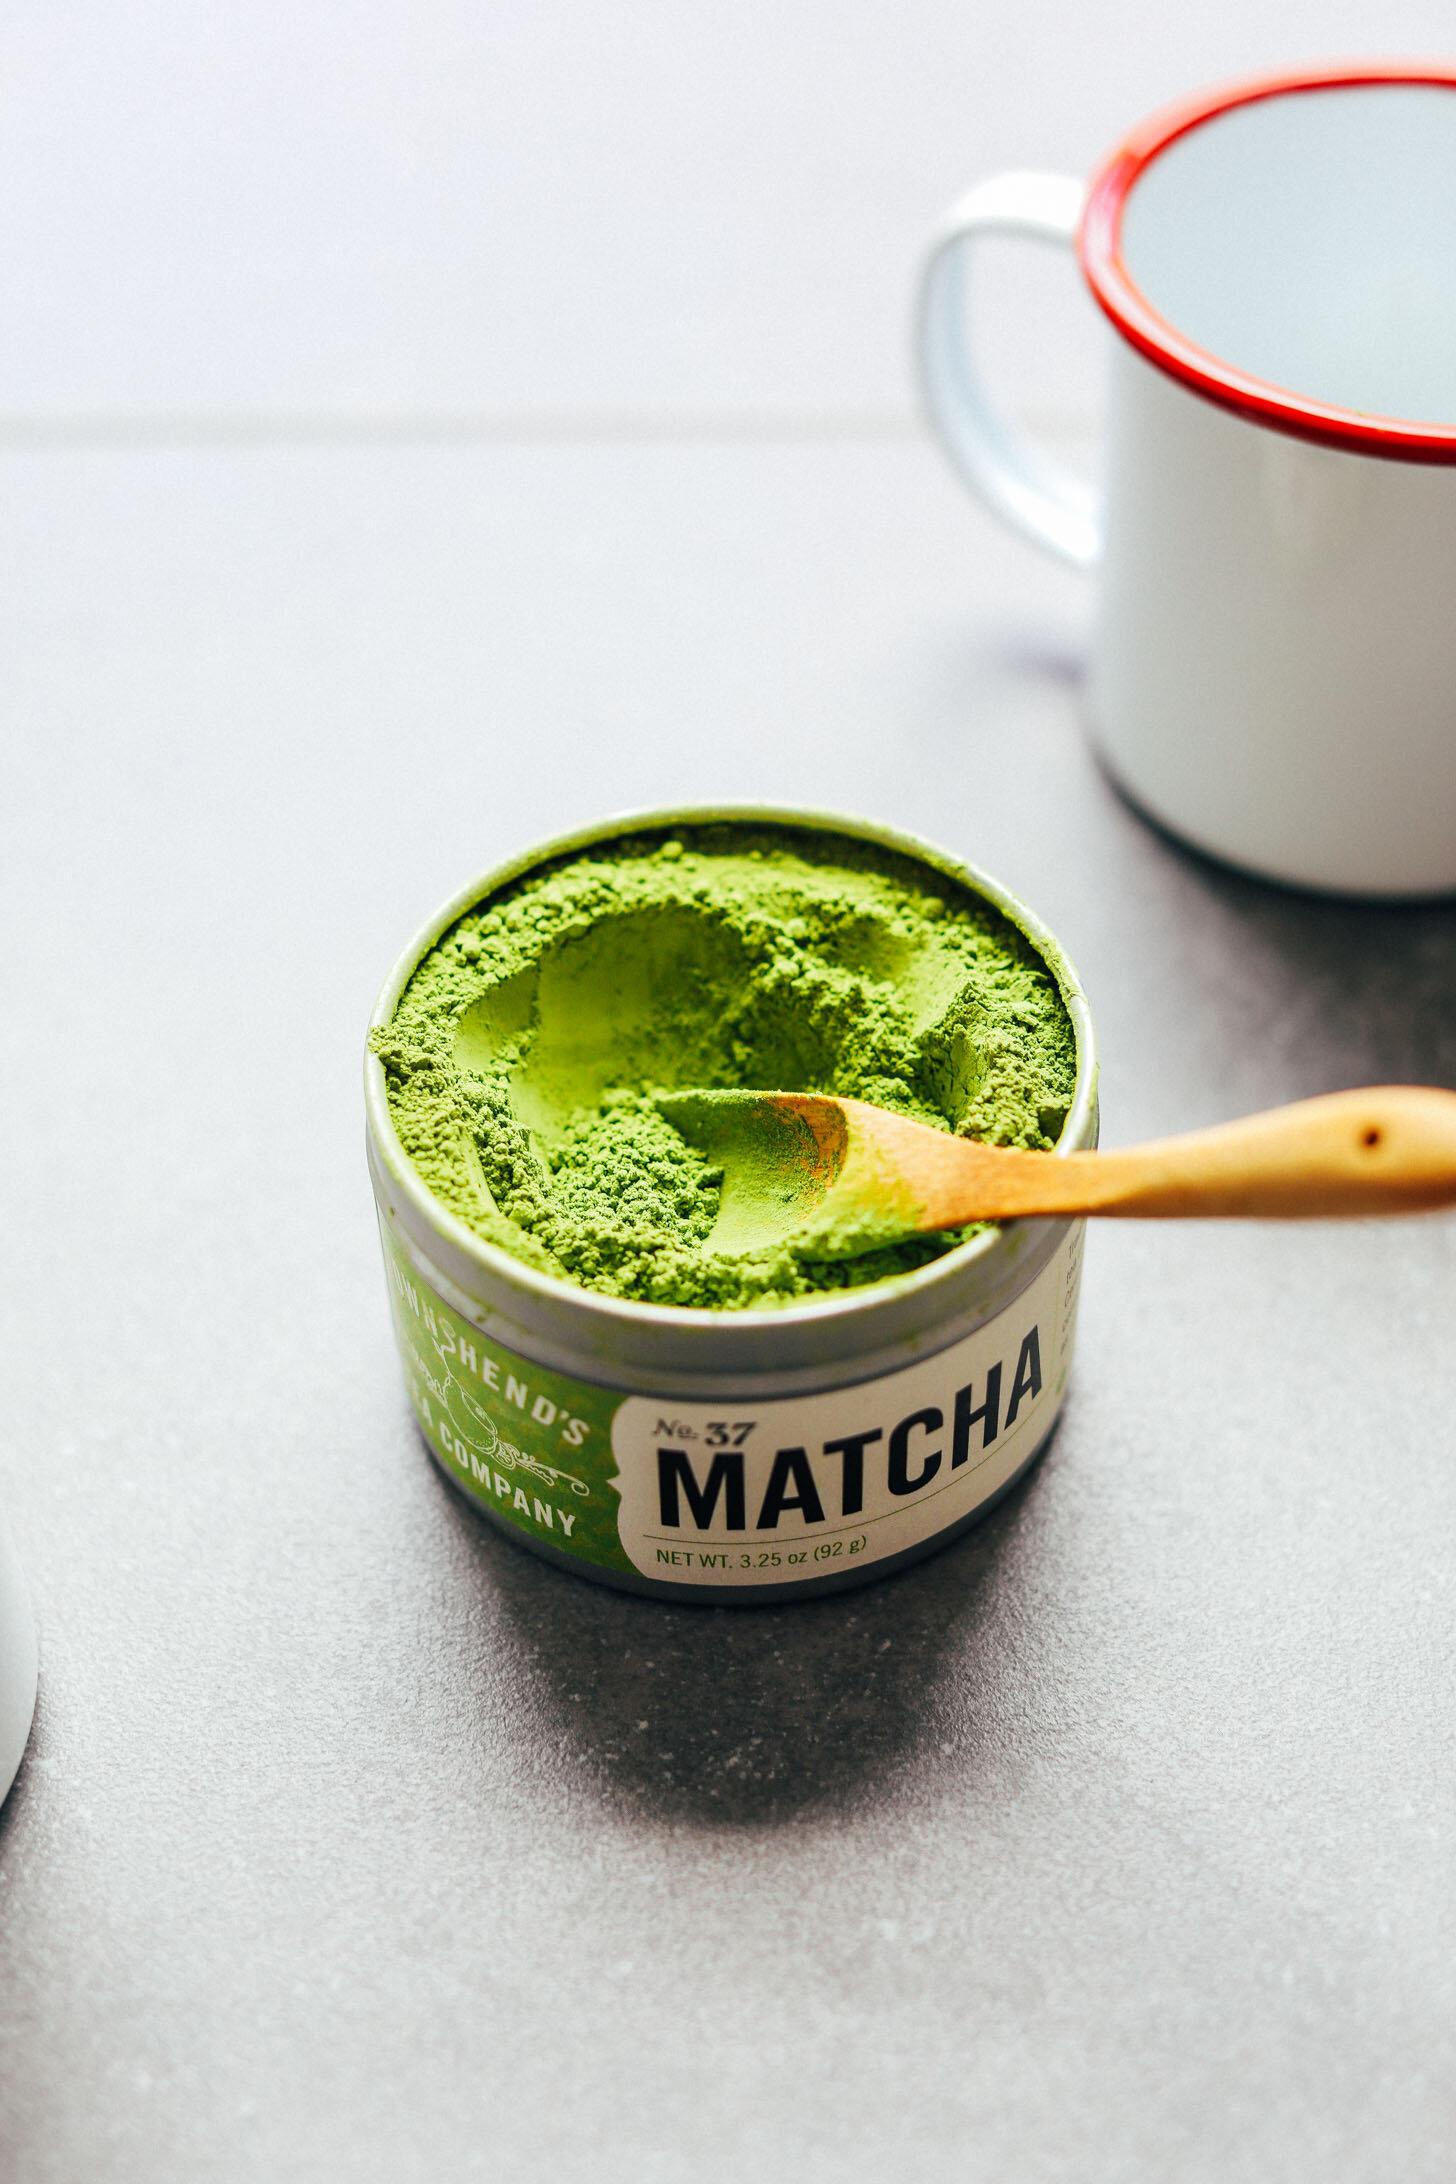 THE-BEST-Matcha-Latte-Creamy-Coconut-and-Macadamia-milk-make-the-perfect-combo-vegan-glutenfree-matcha-latte-recipe-5.jpg